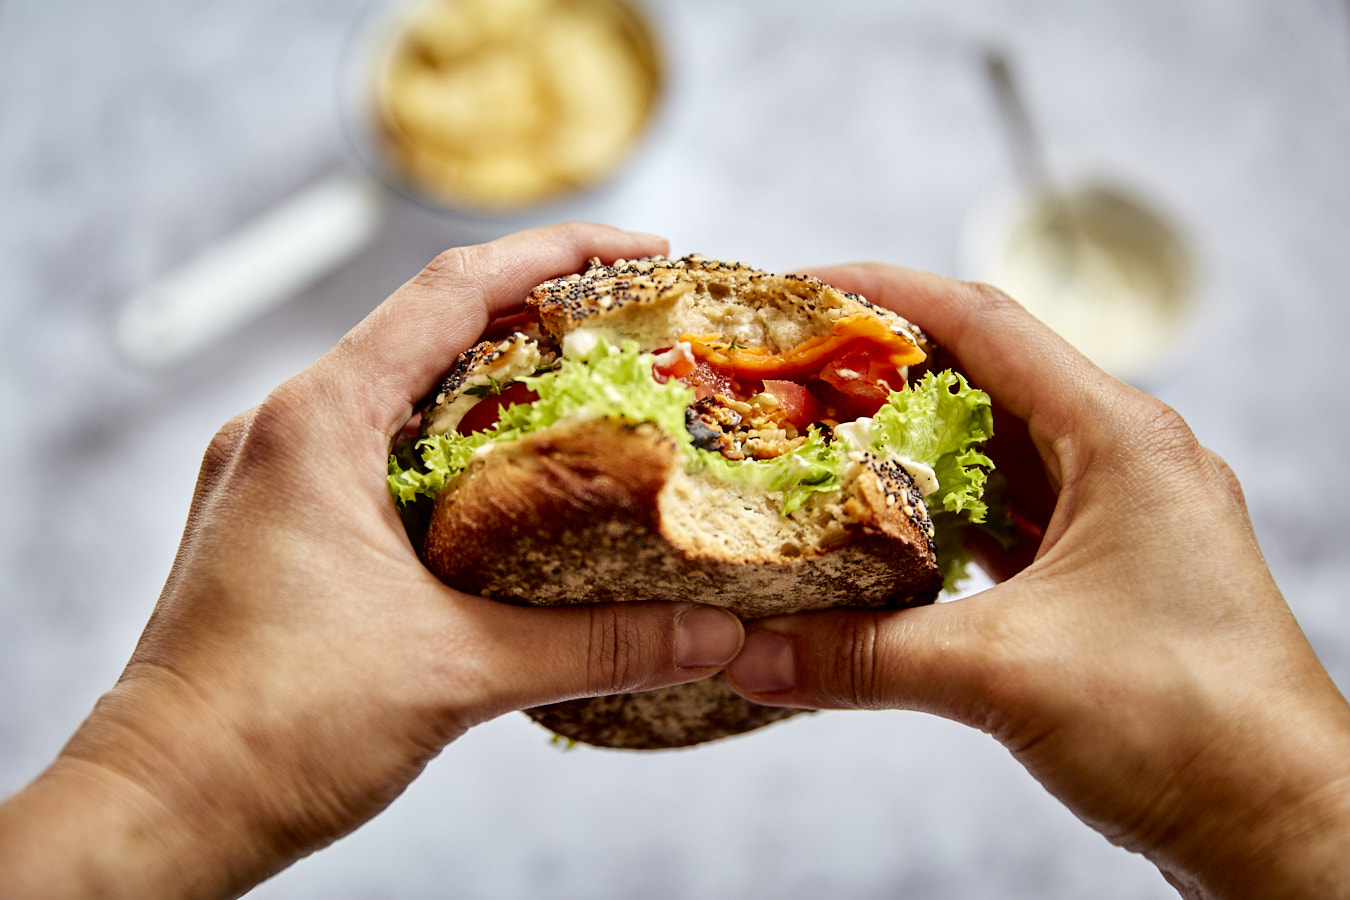 foodfotografie-veggie-burger